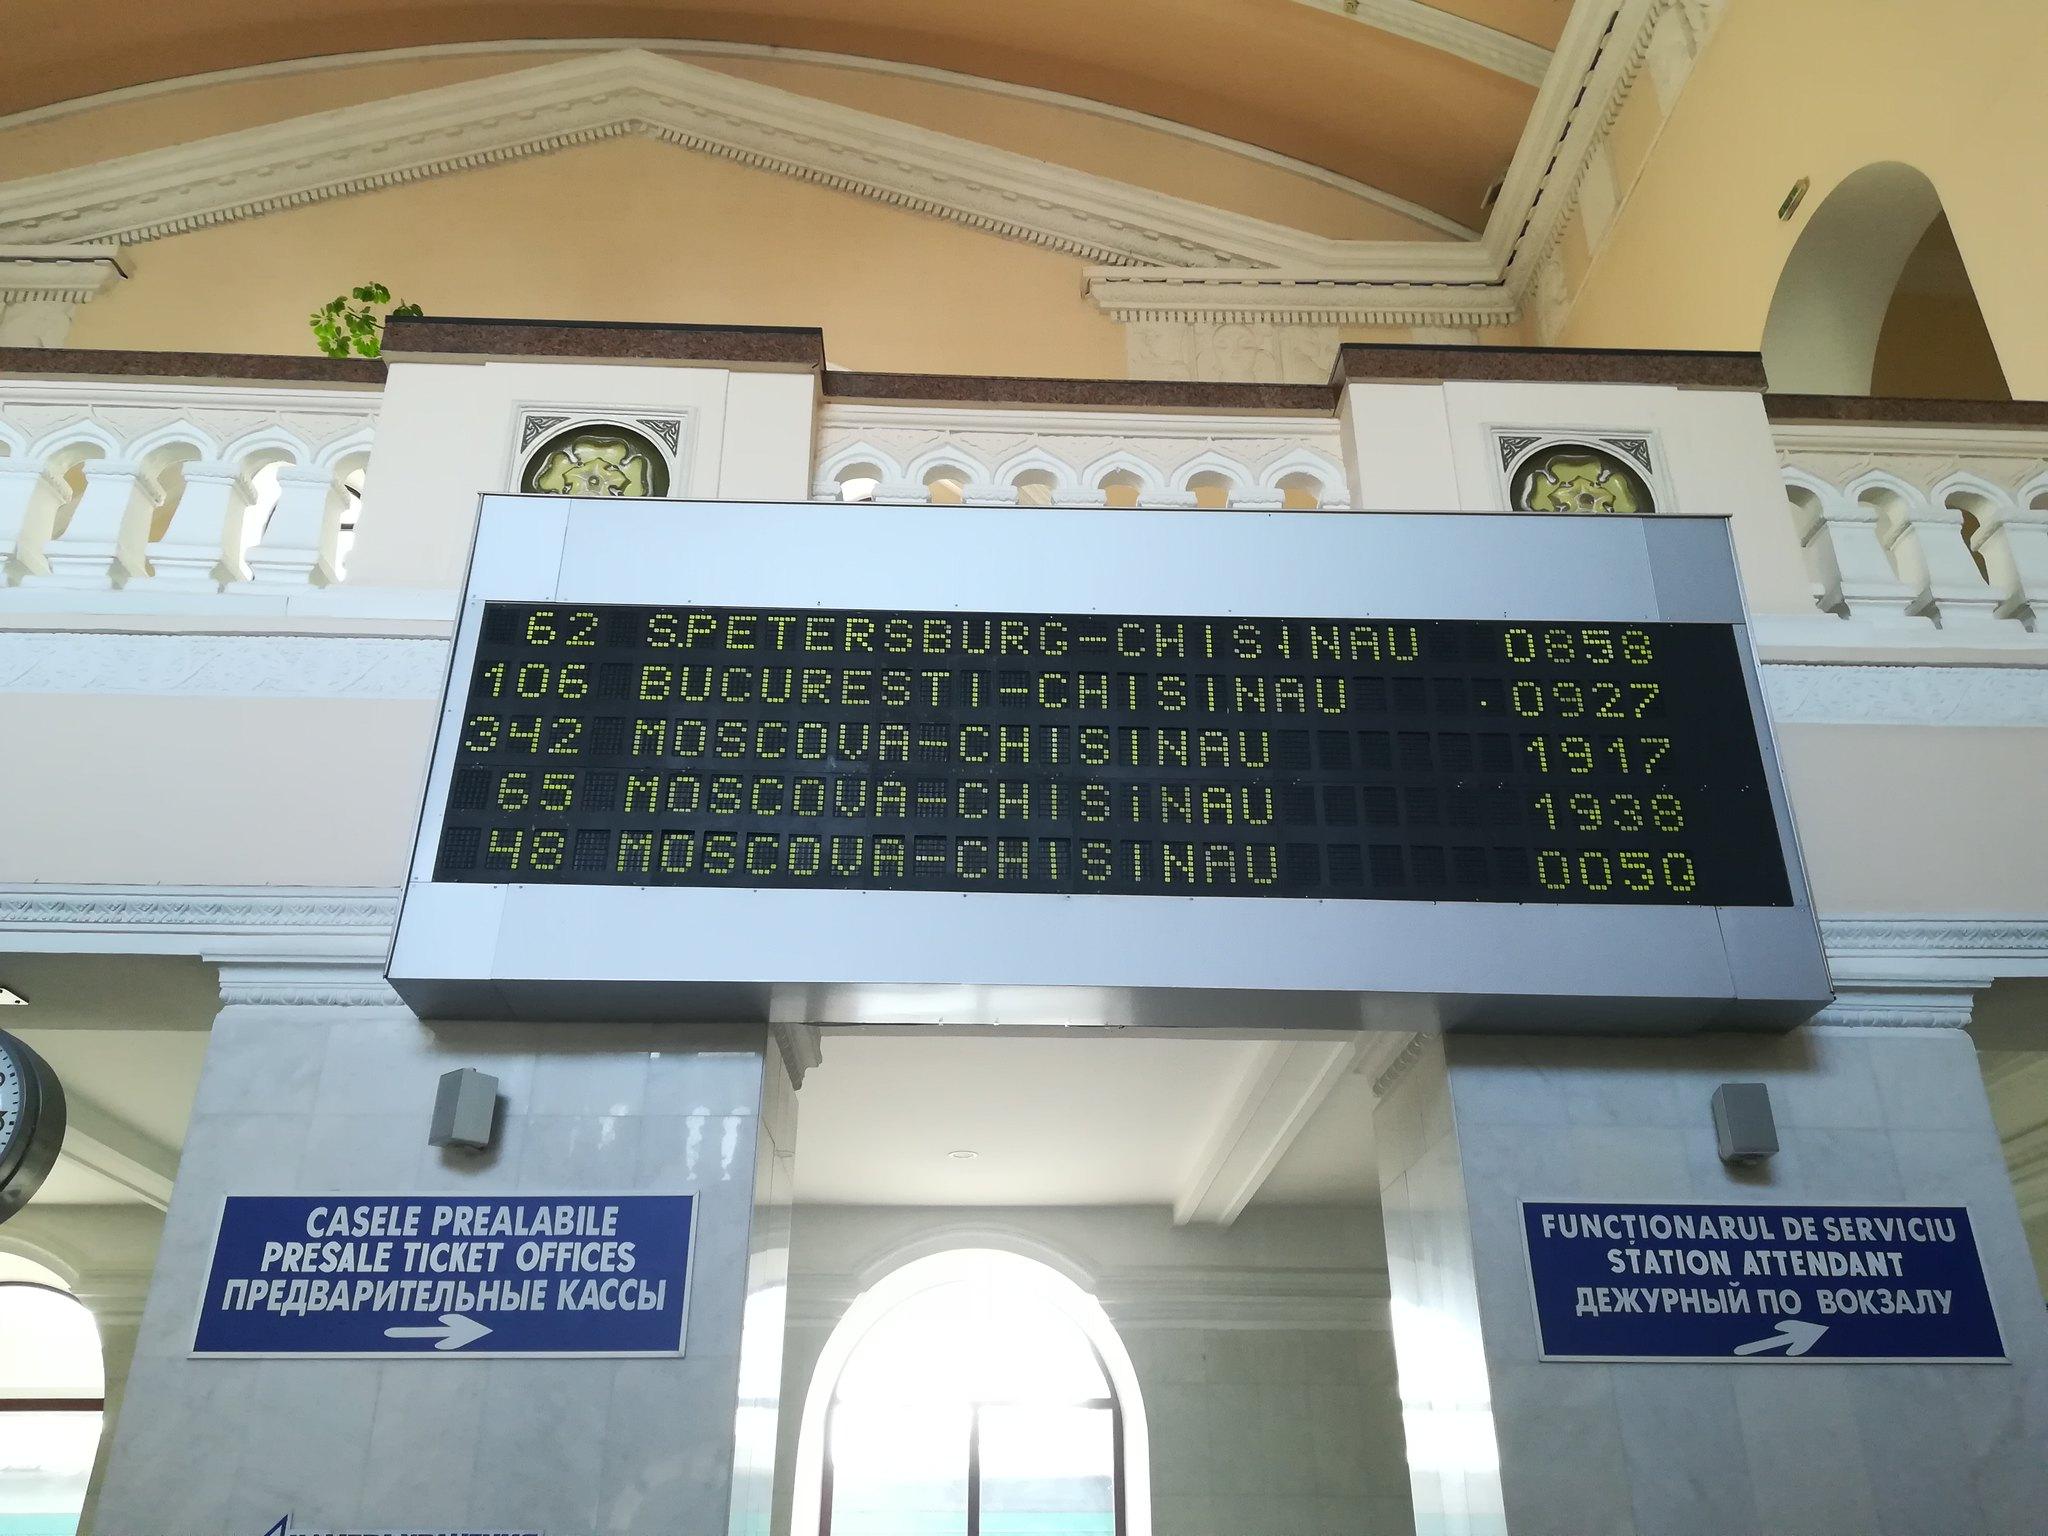 Reportaje feroviare Adirmvl - Pagina 15 44137627694_4c3c997a72_k